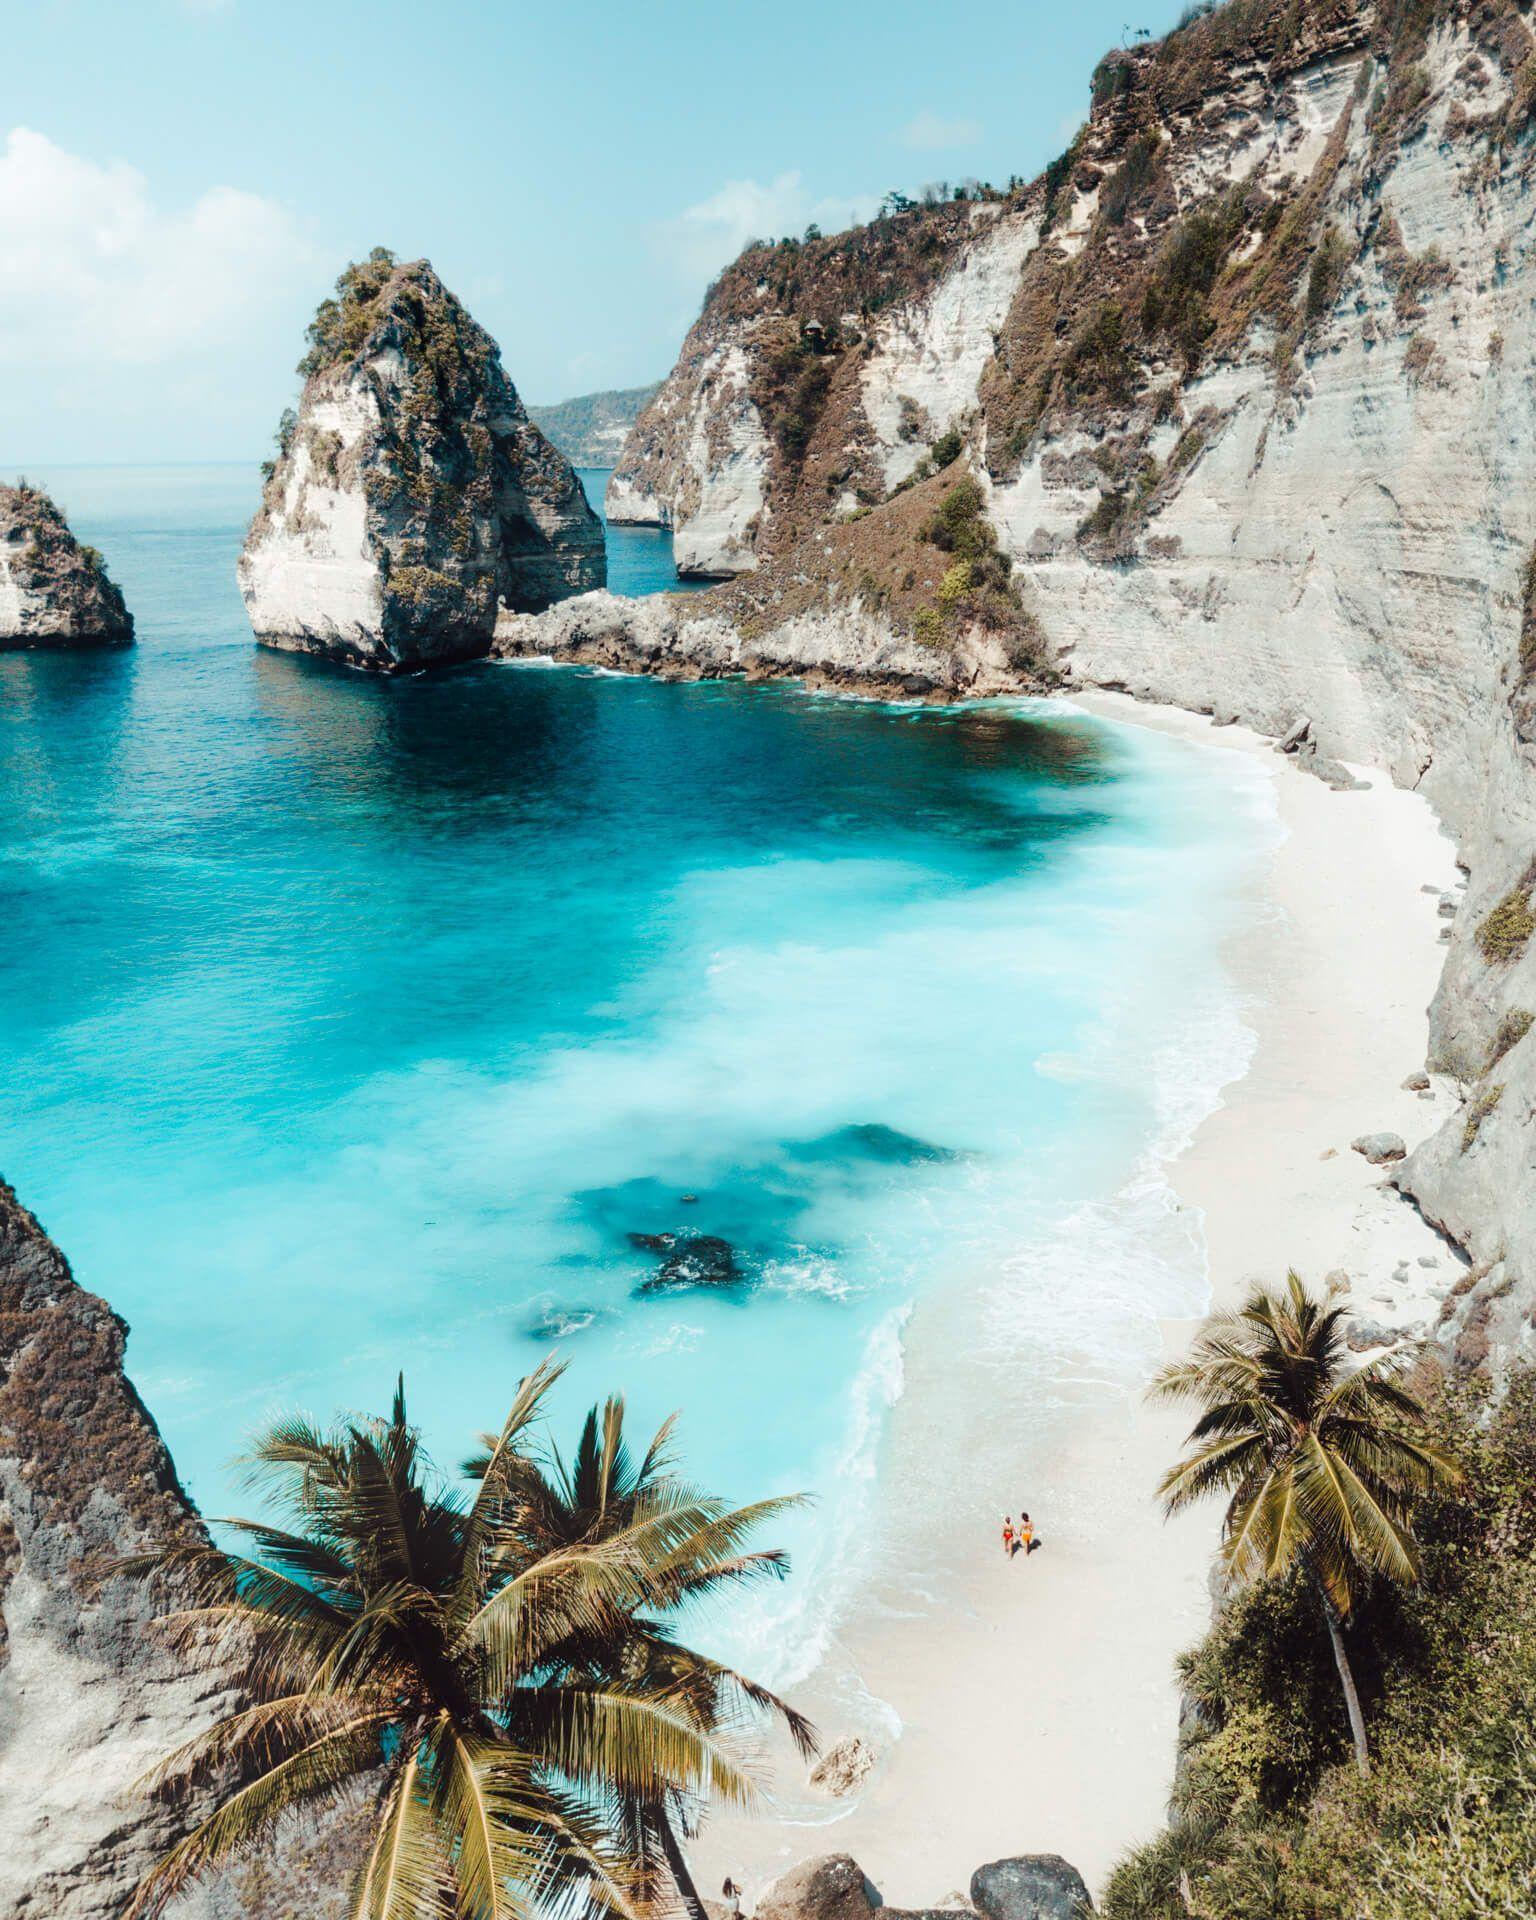 undefined #Travel beach DIAMOND BEACH - Most Beautiful Beach on Nusa Penida in Bali #blue